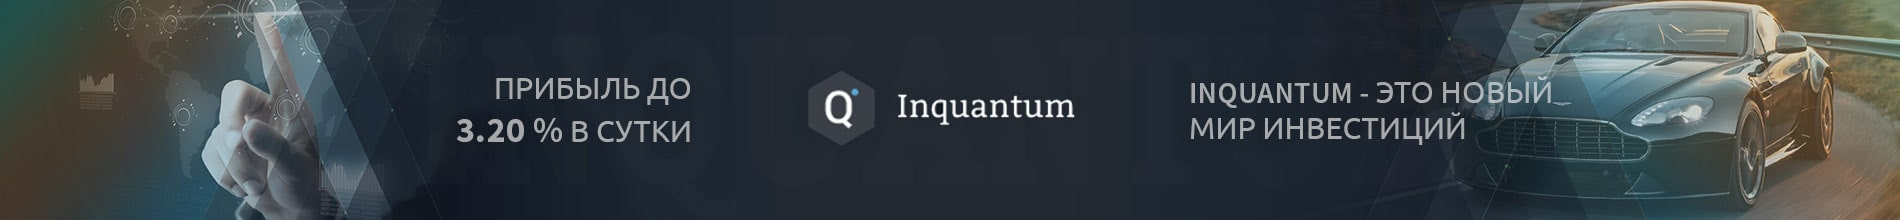 Баннер в шапке inquantum